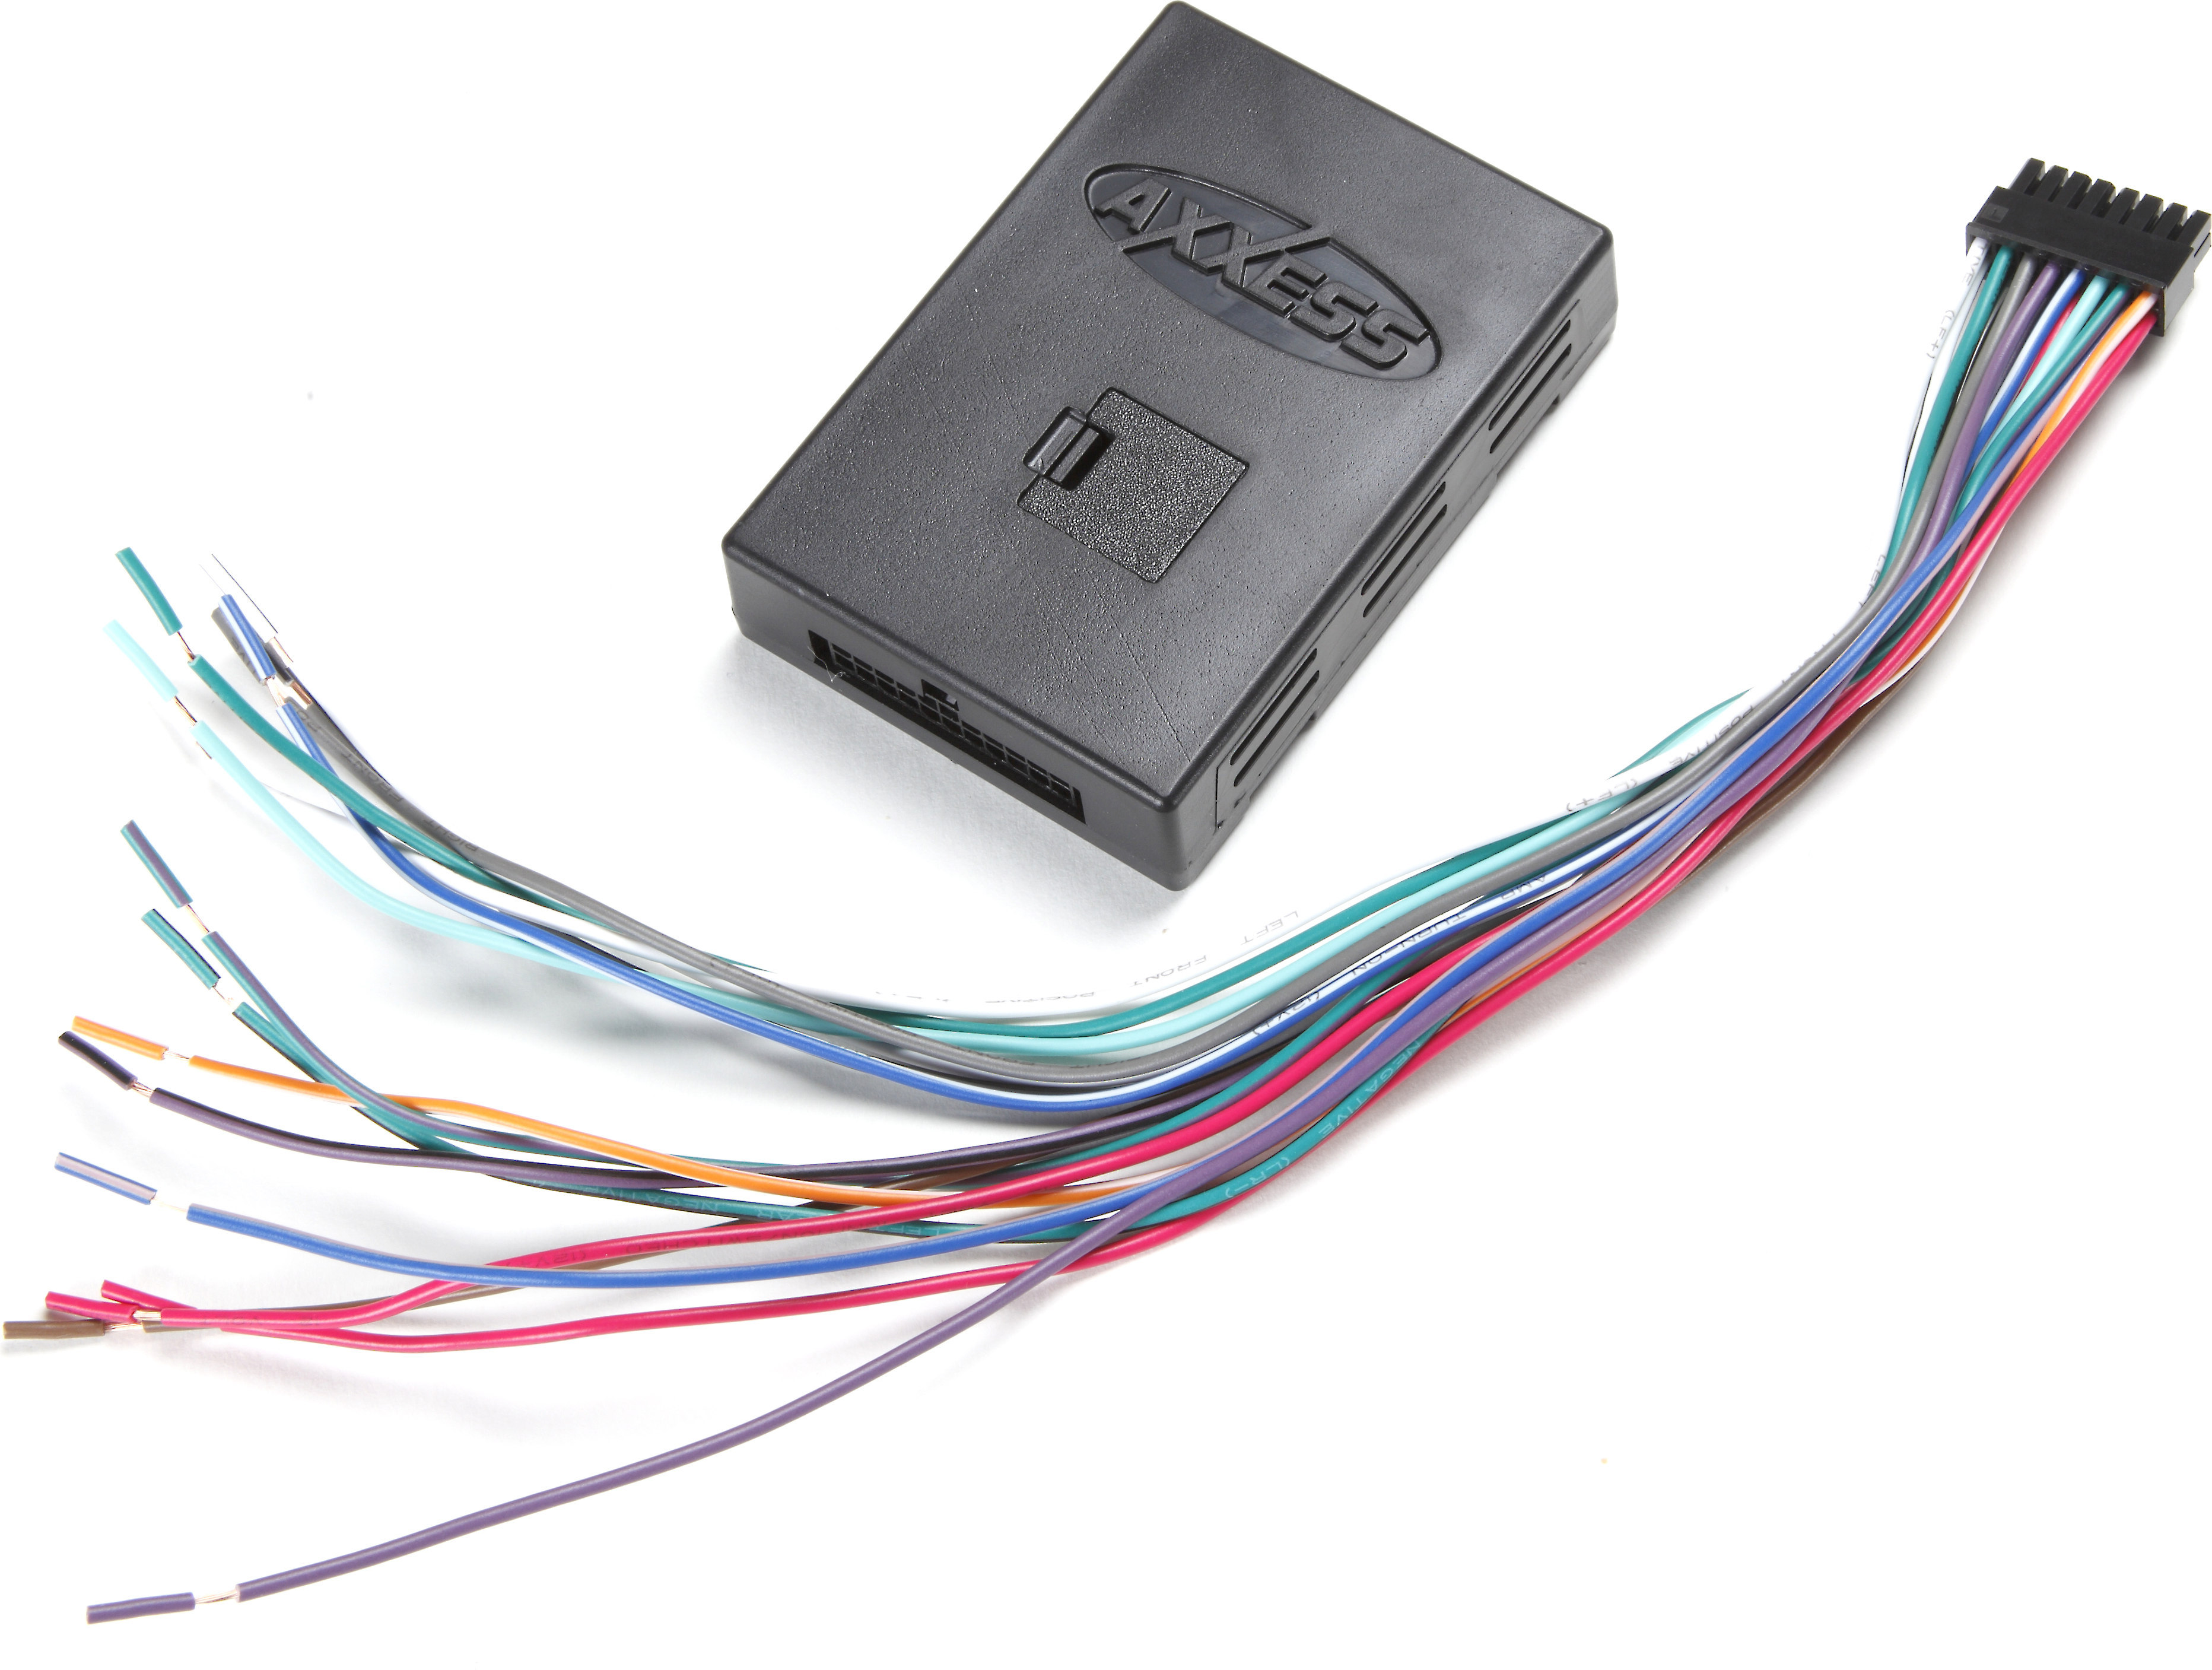 Wiring Diagram Besides 2011 Dodge Journey On 2007 Dodge Caliber Radio